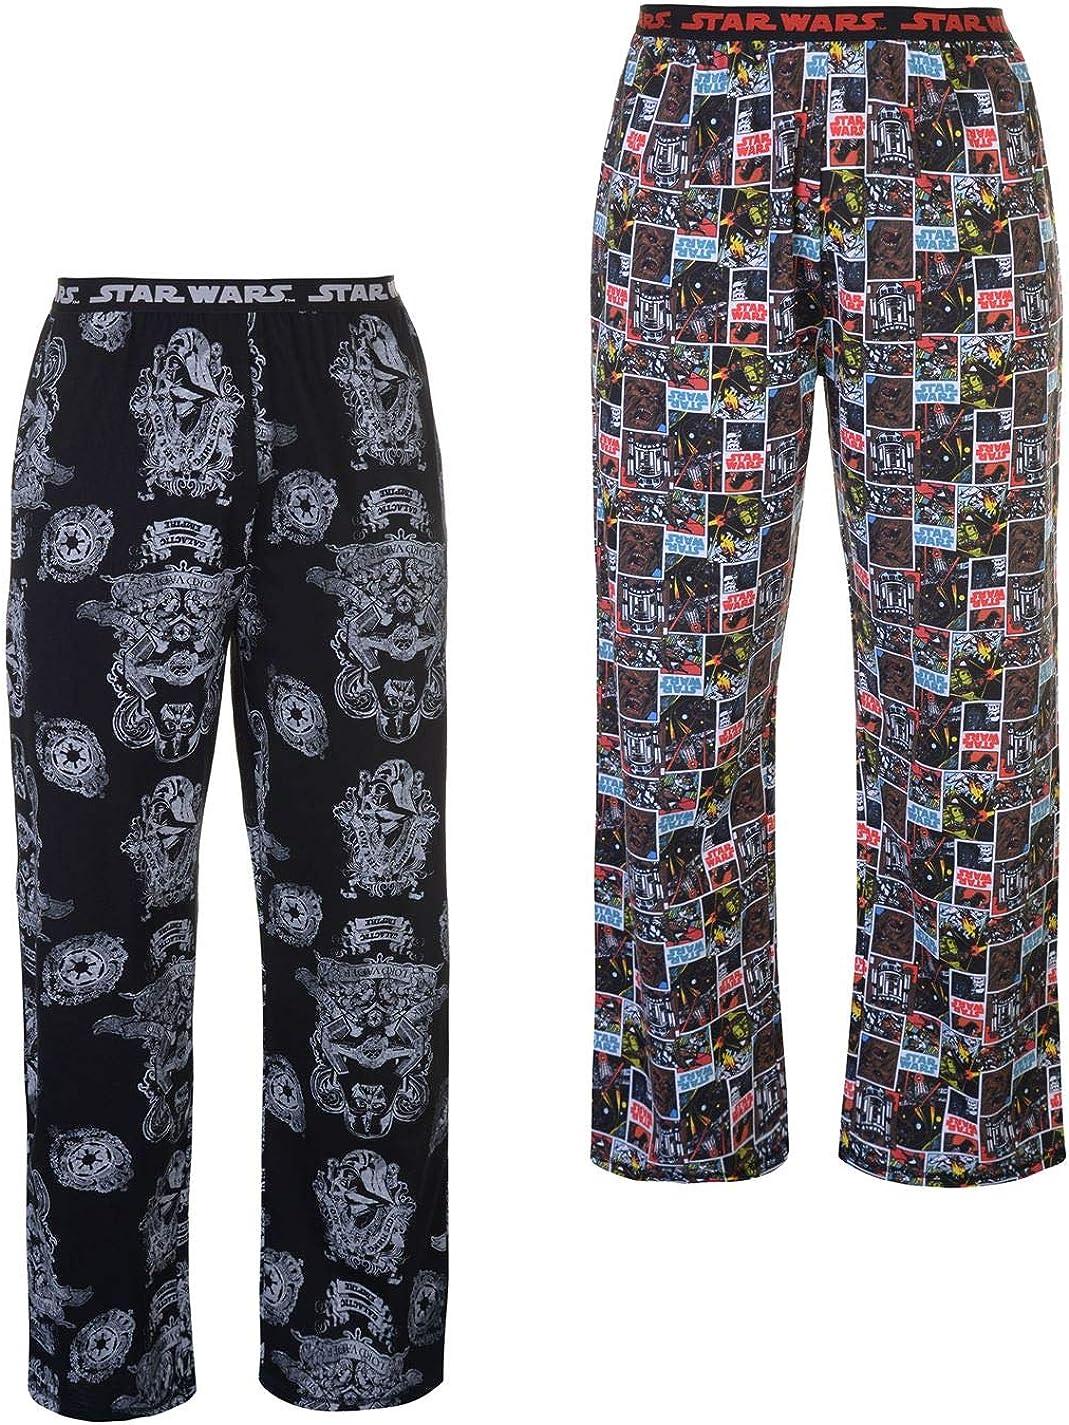 Star Wars, X-Large Mens 2 Pack Star Wars Lounge Pants Pyjamas Pj Bottoms Trousers Cartoon Adults Nightwear